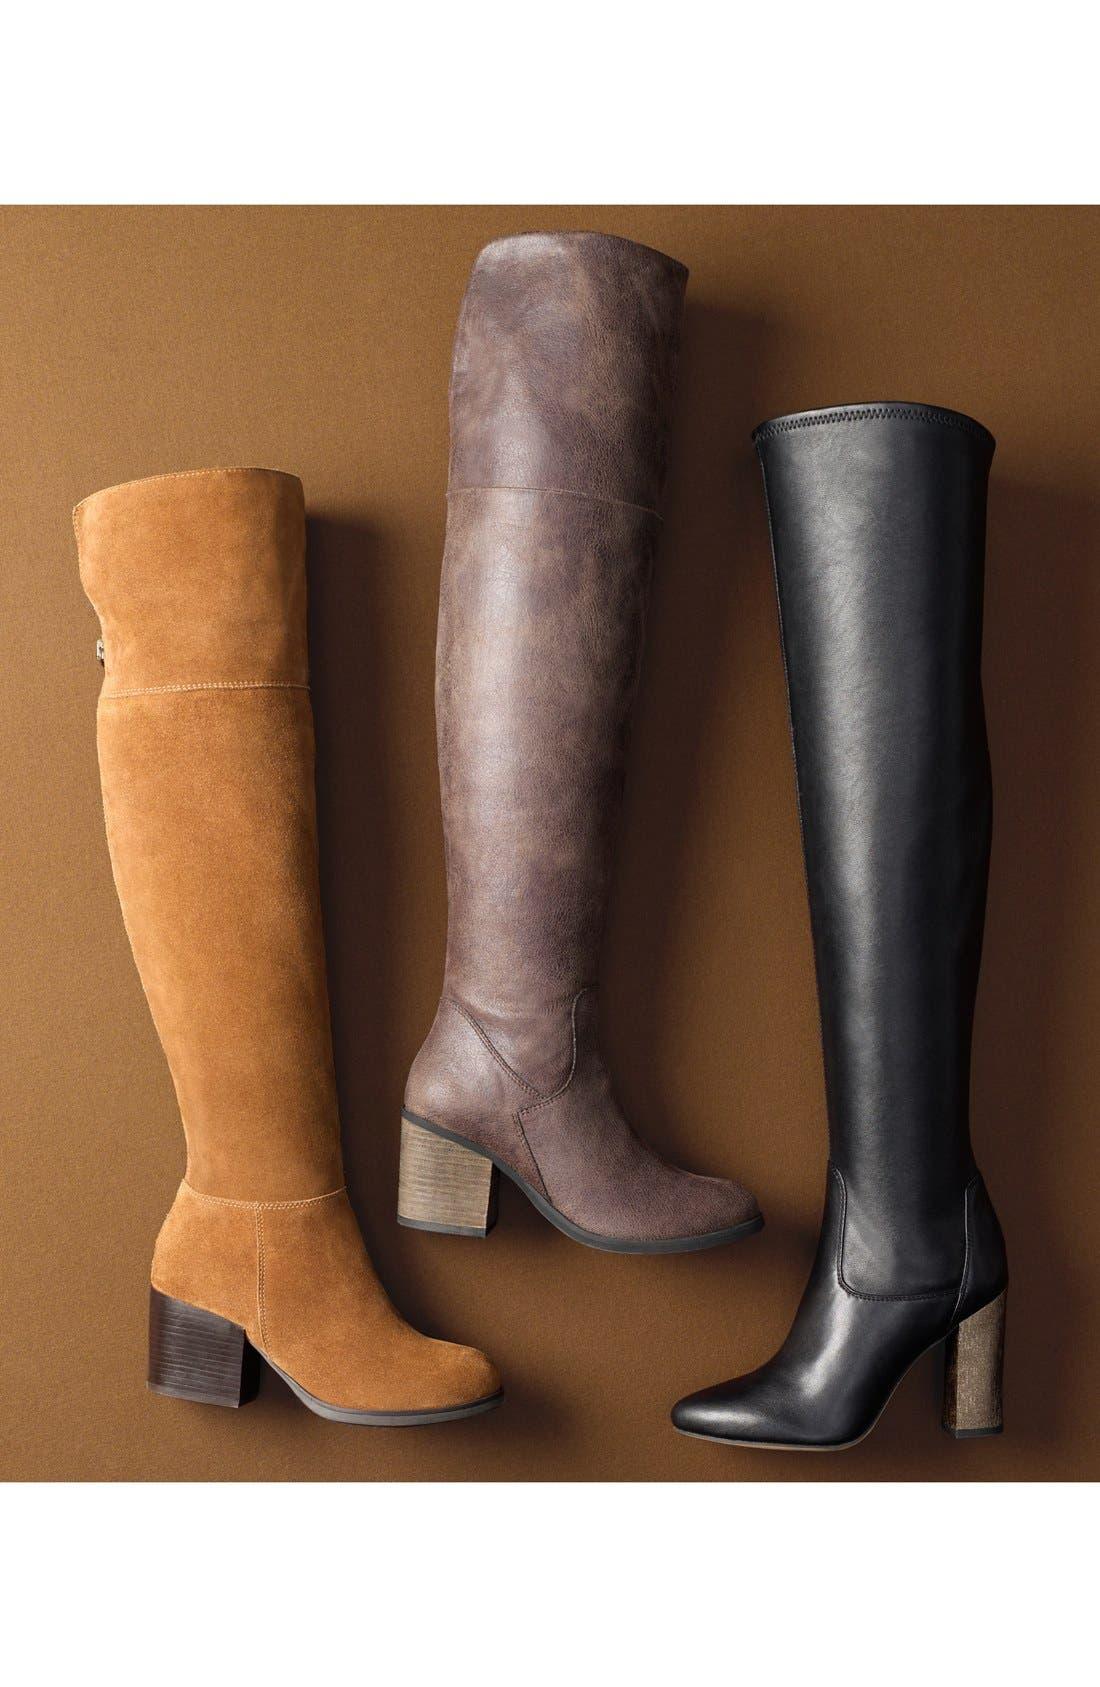 'Orabela' Knee High Boot,                             Alternate thumbnail 5, color,                             006